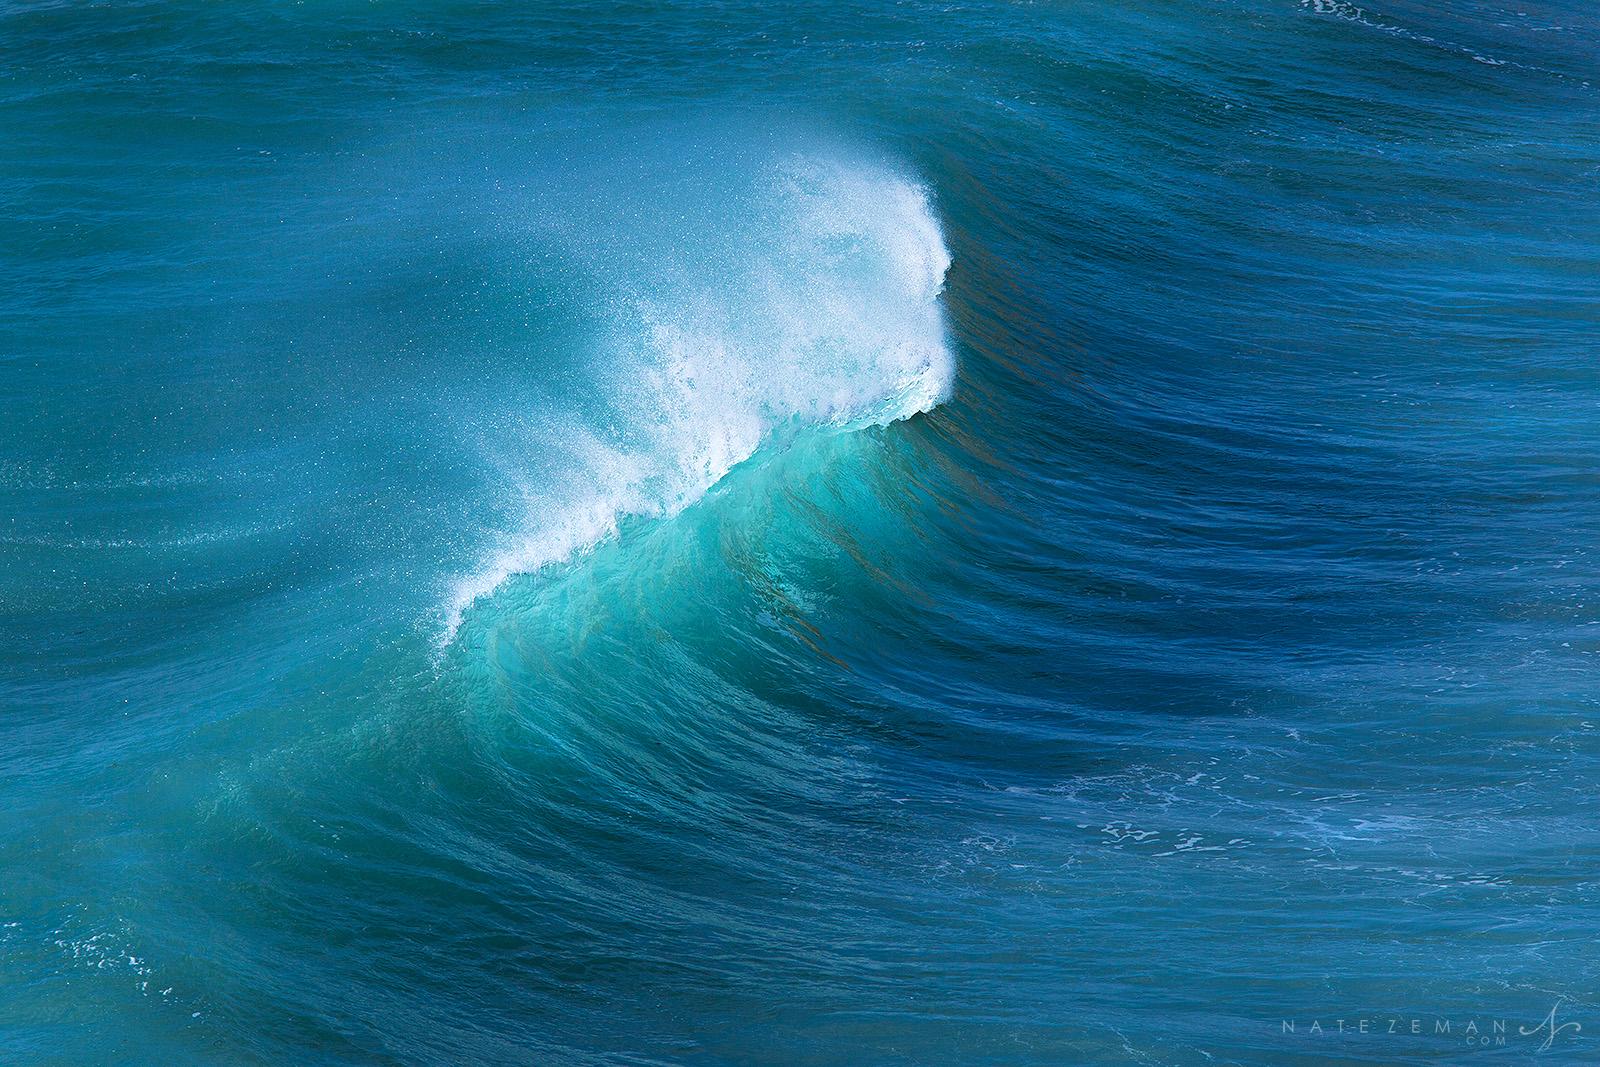 porthtowan, cornwall, united kingdom, wave, blue, , photo